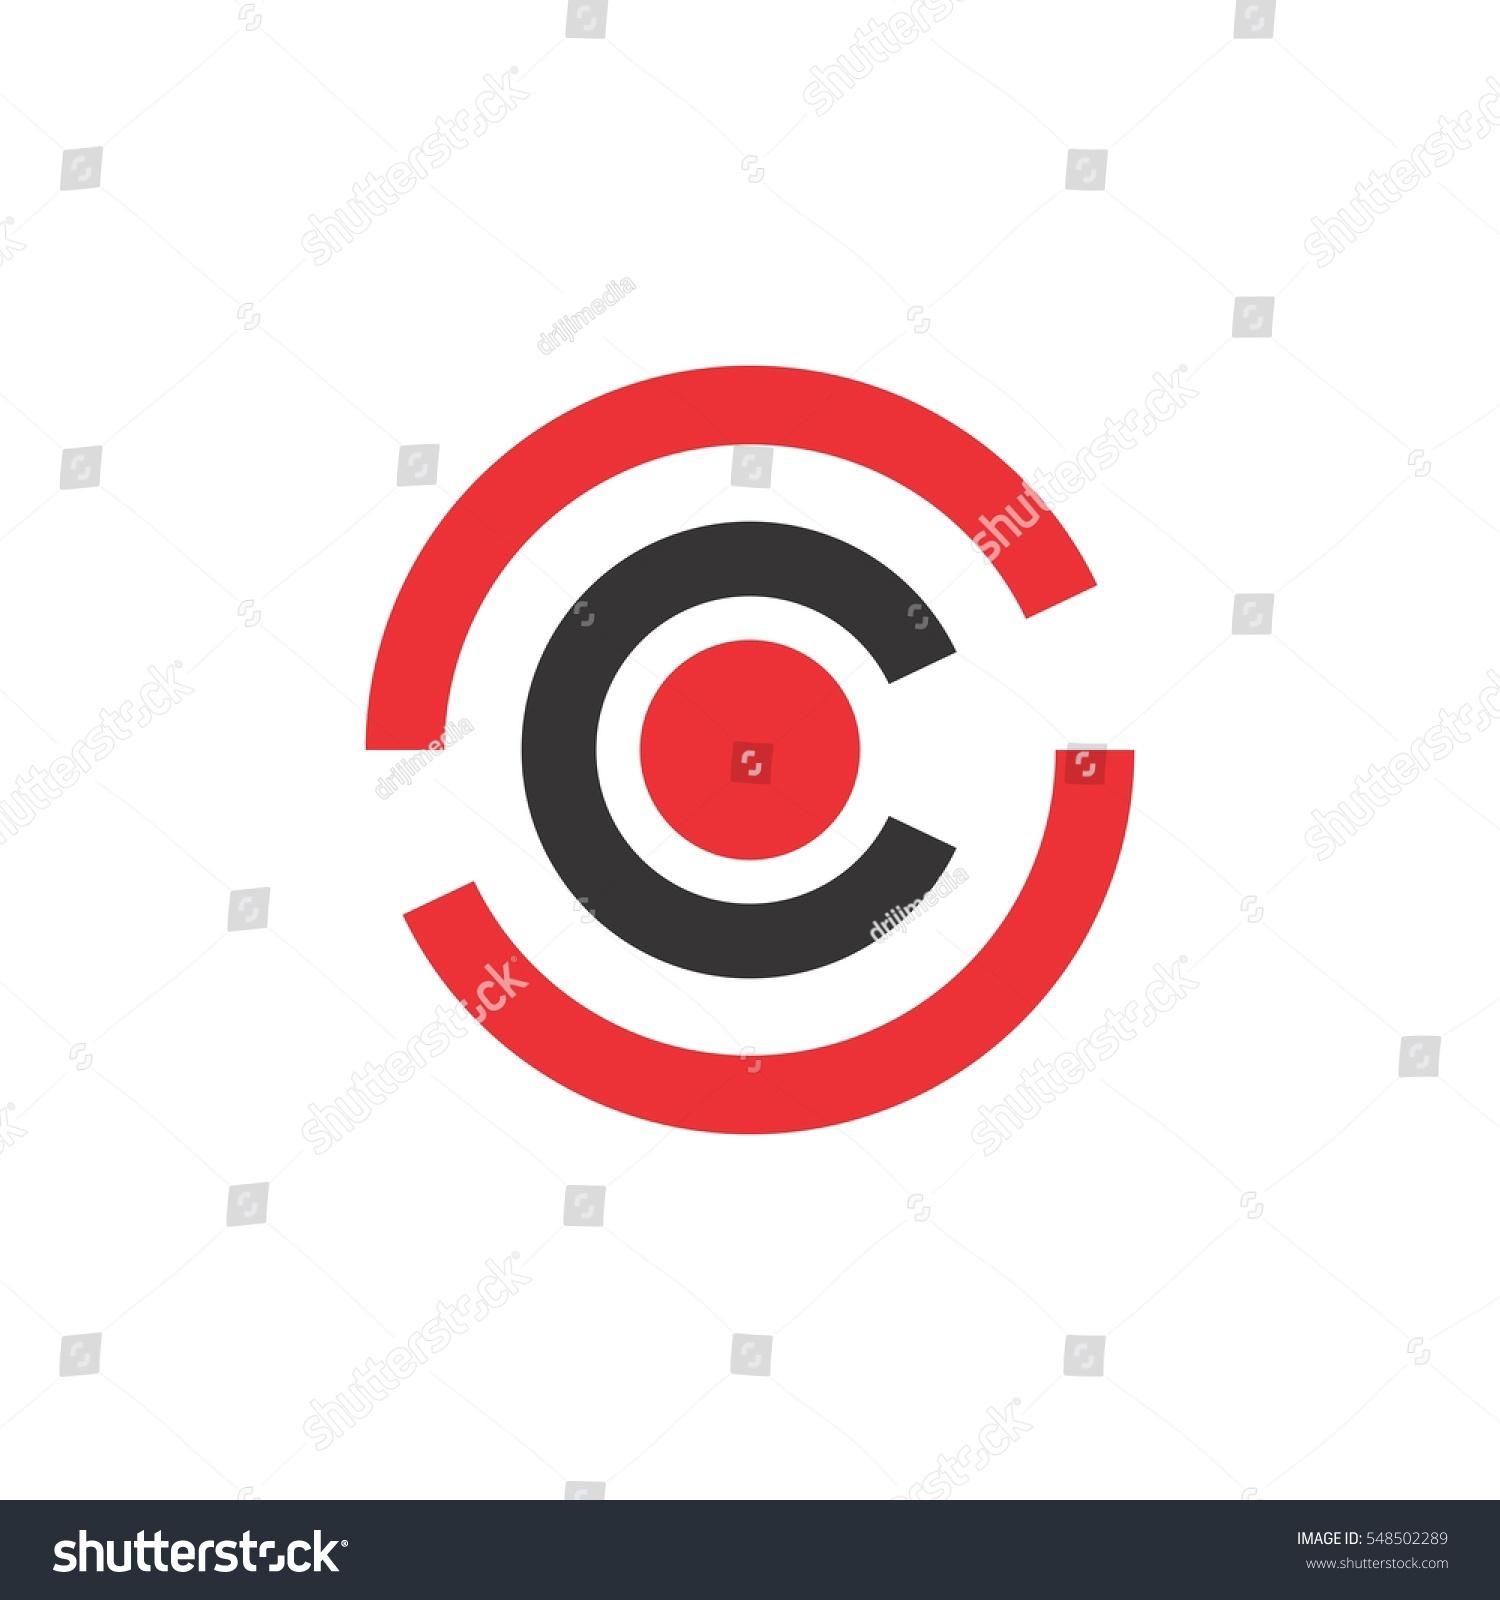 Letter c circle dot center logo stock vector 548502289 shutterstock letter c in circle with dot in center logo vector biocorpaavc Images